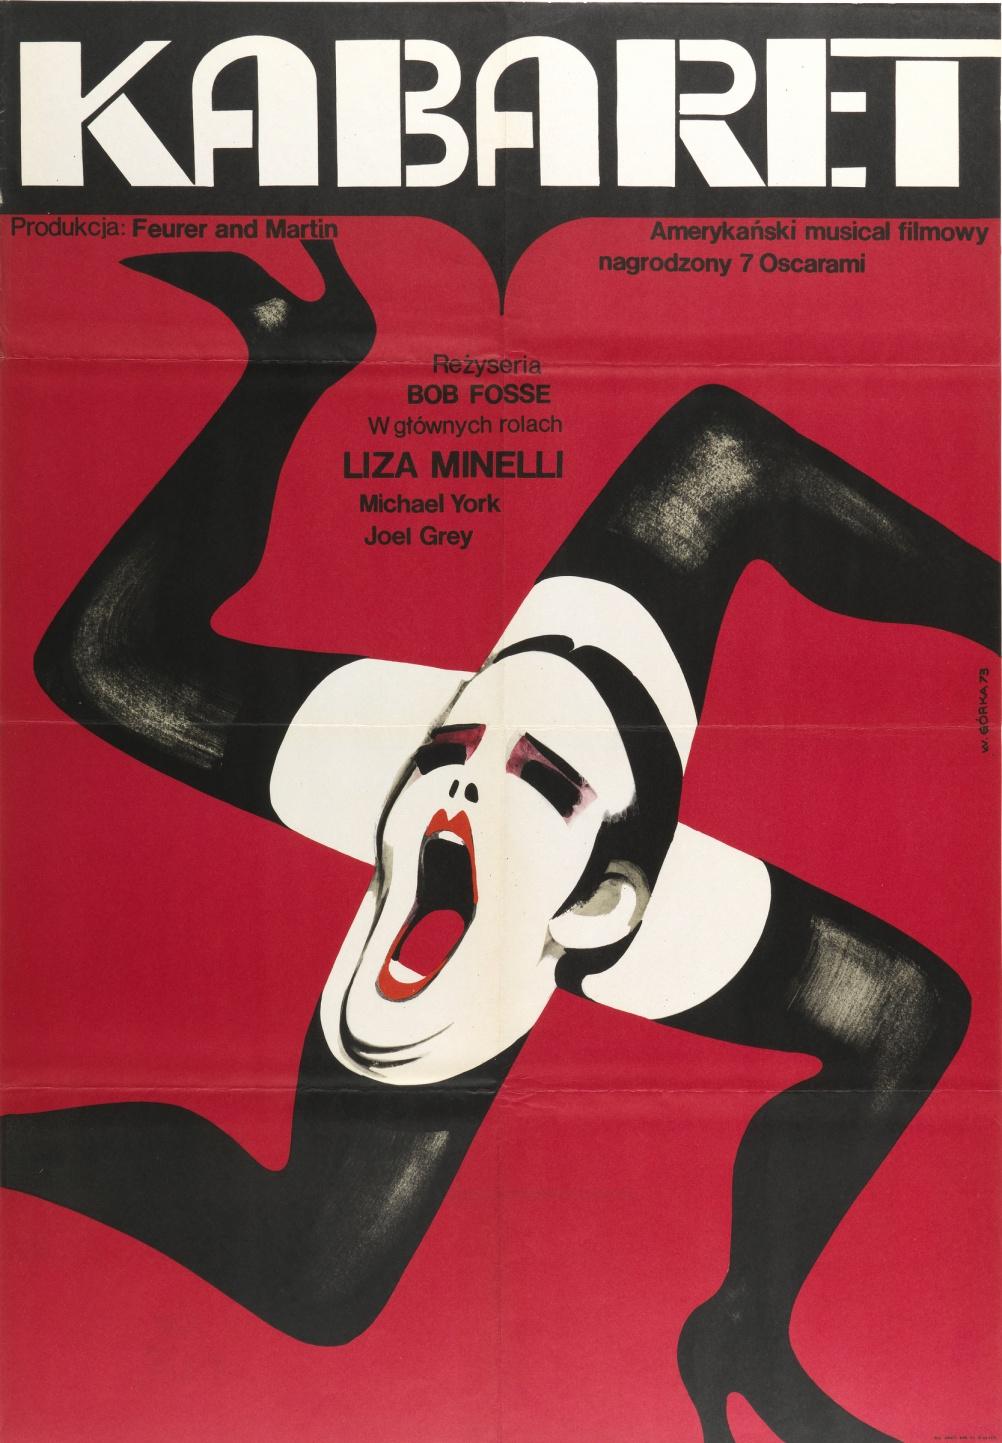 Kabaret by Wiktor Górka, 1973